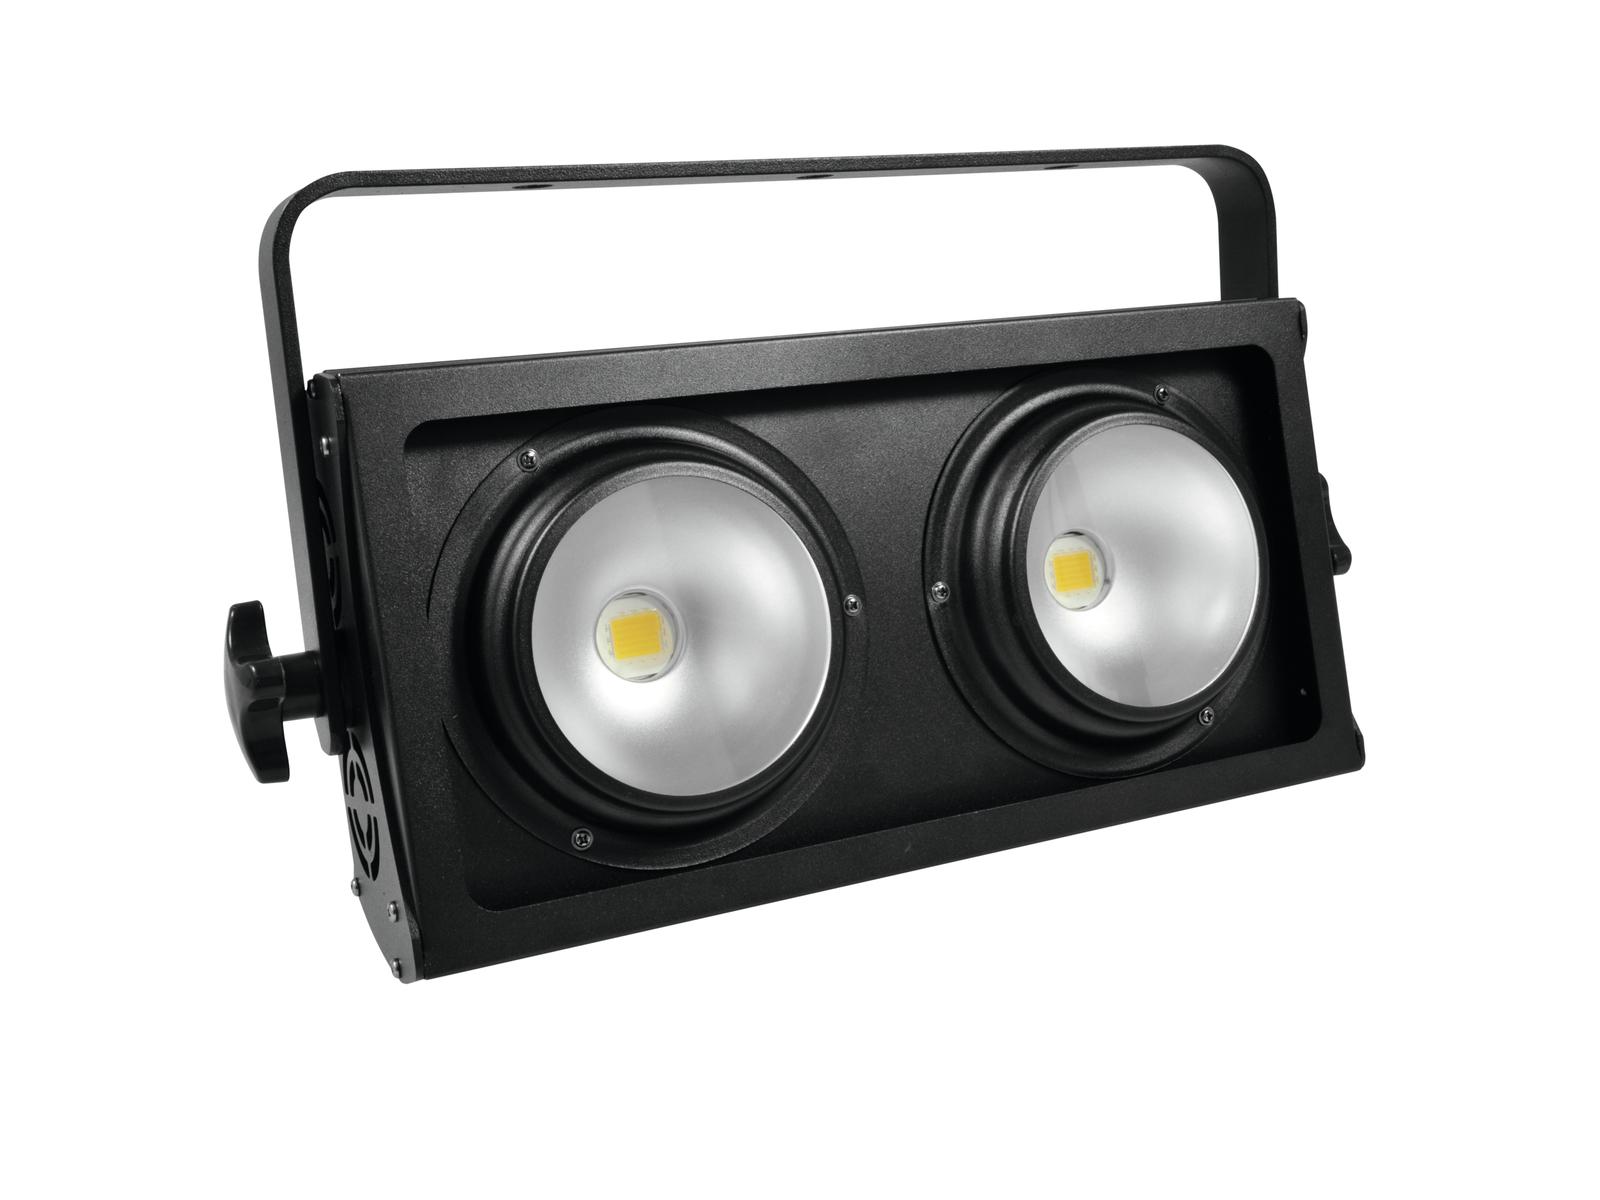 EUROLITE Pubblico Blinder 2x100W COB LED 3200K